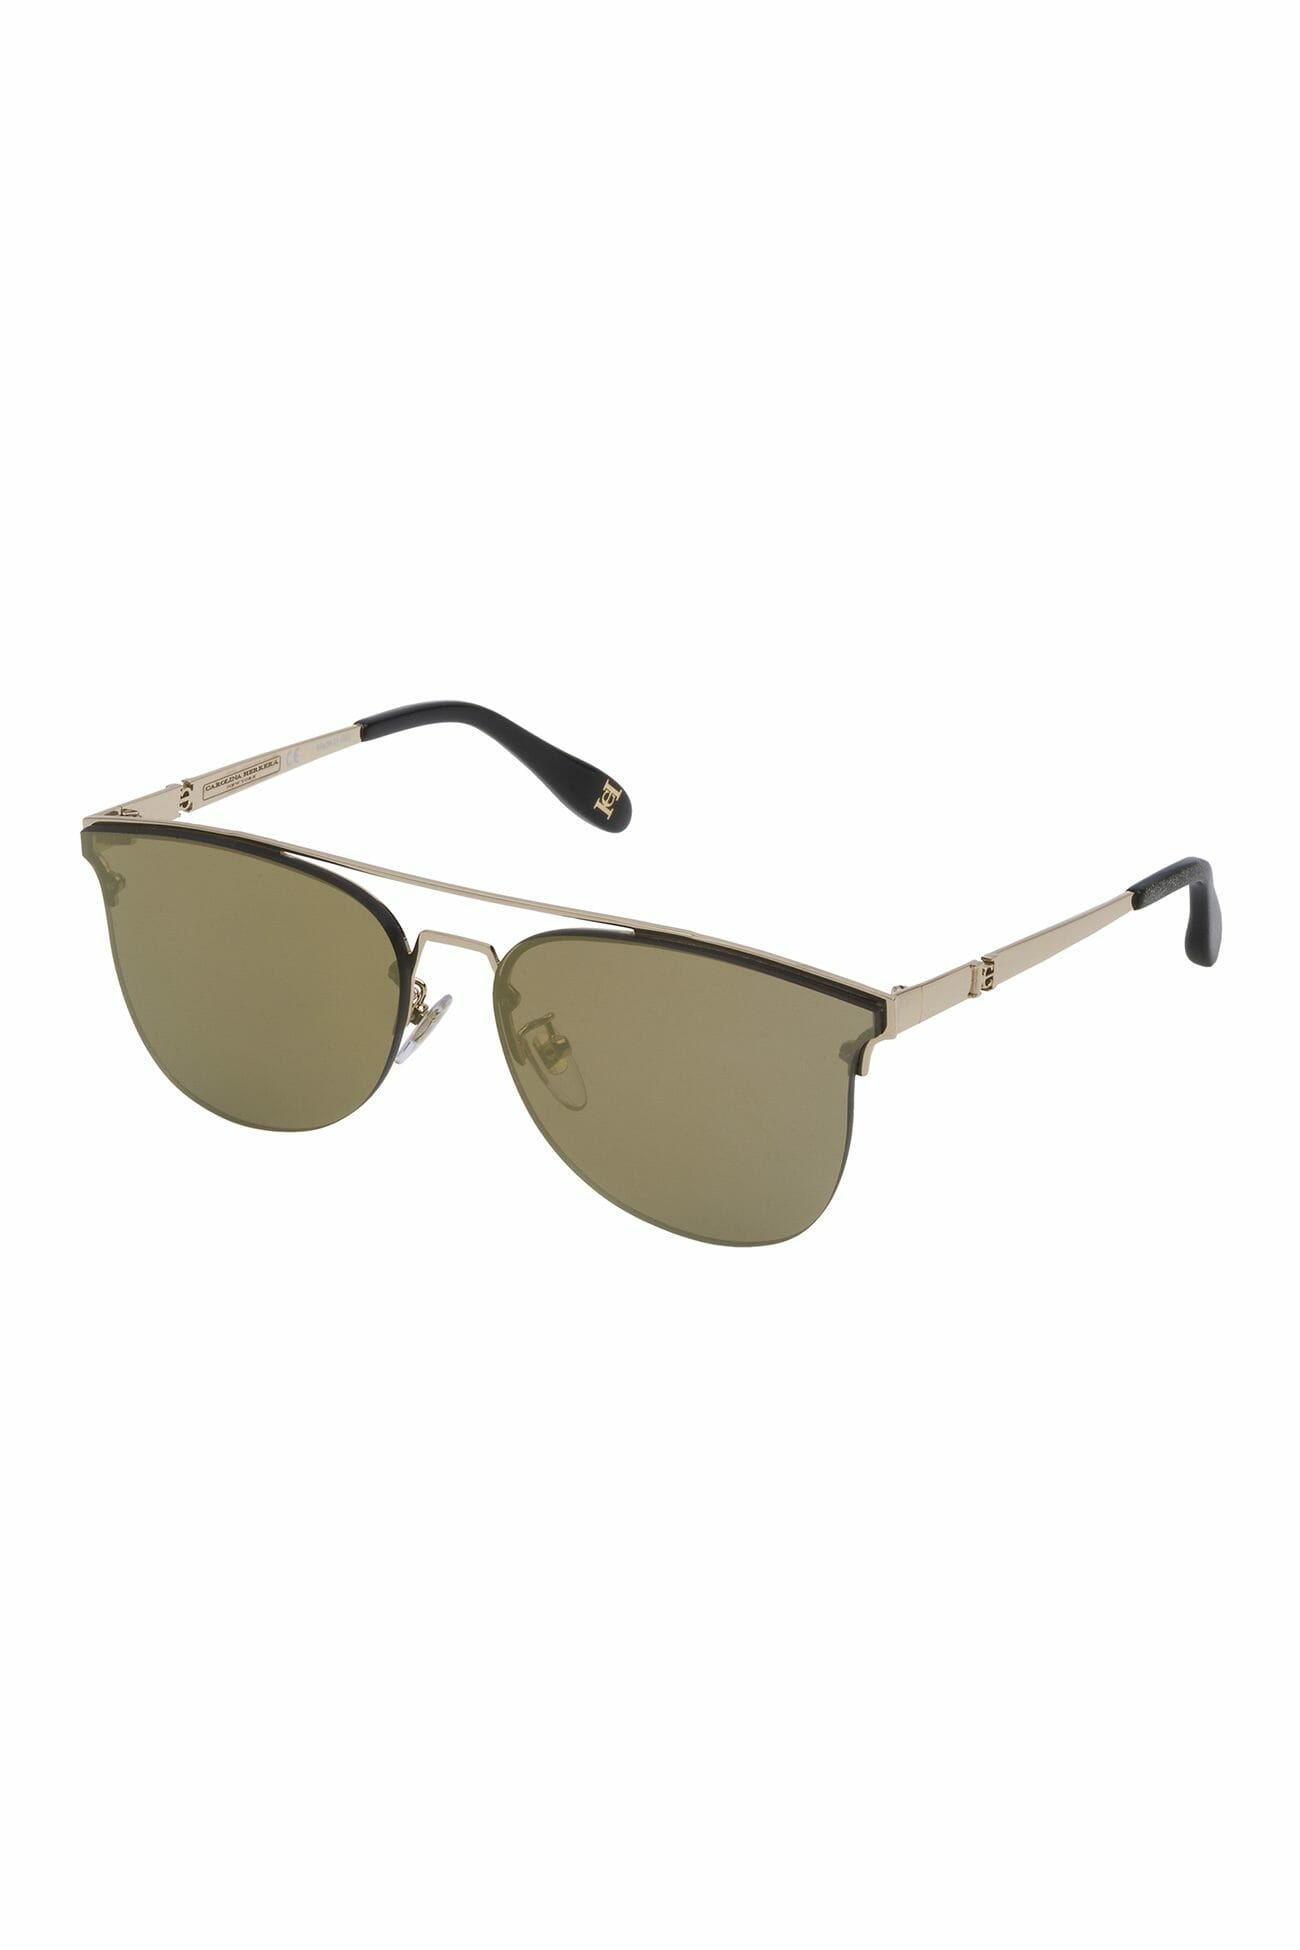 Carolina-Herrera-New-York-Eyewear-Reference300G-01